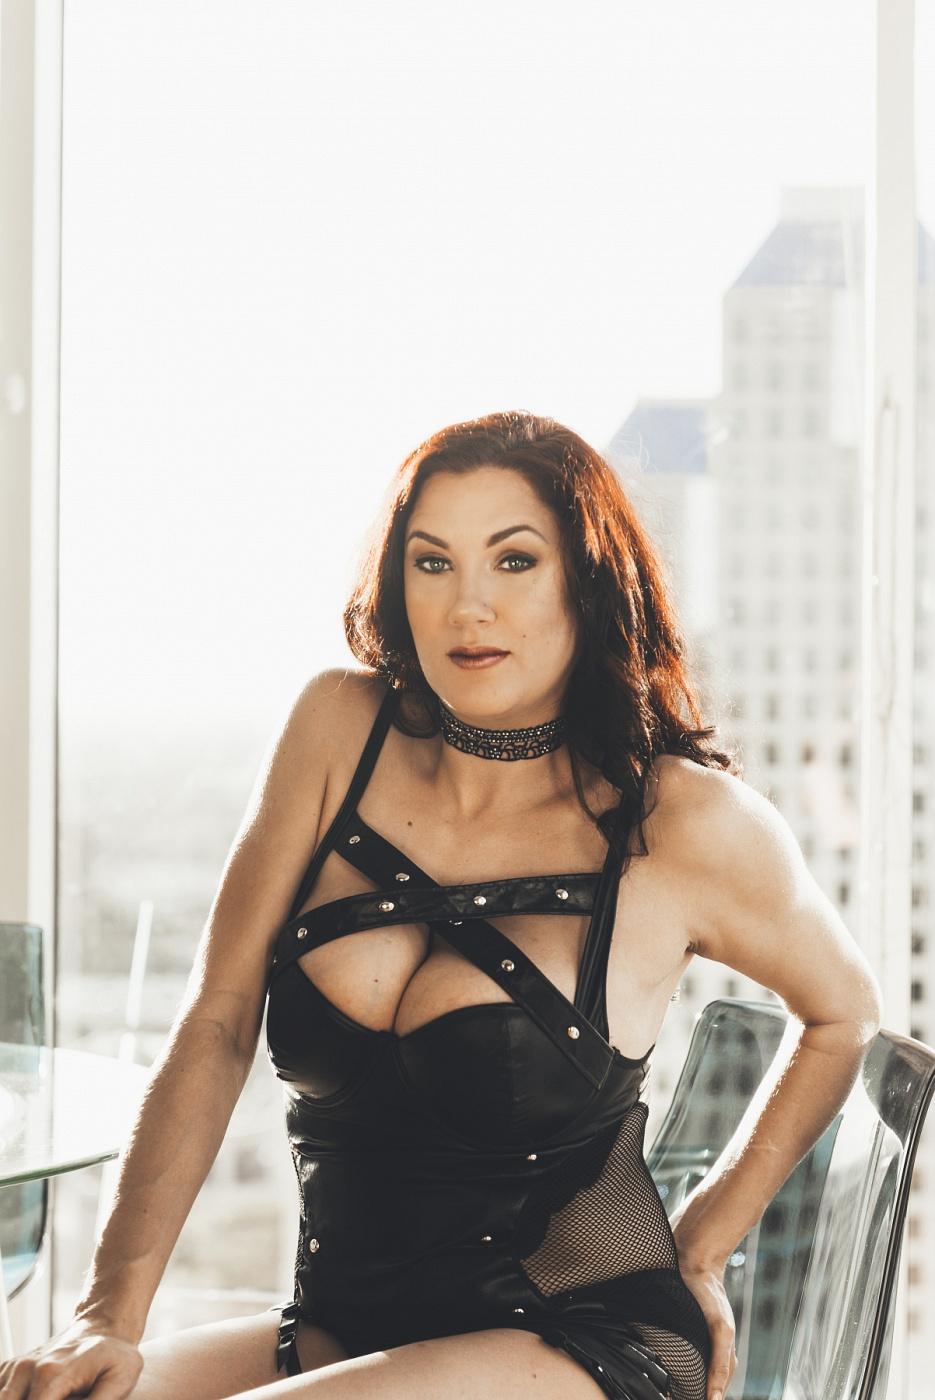 Danica Malone